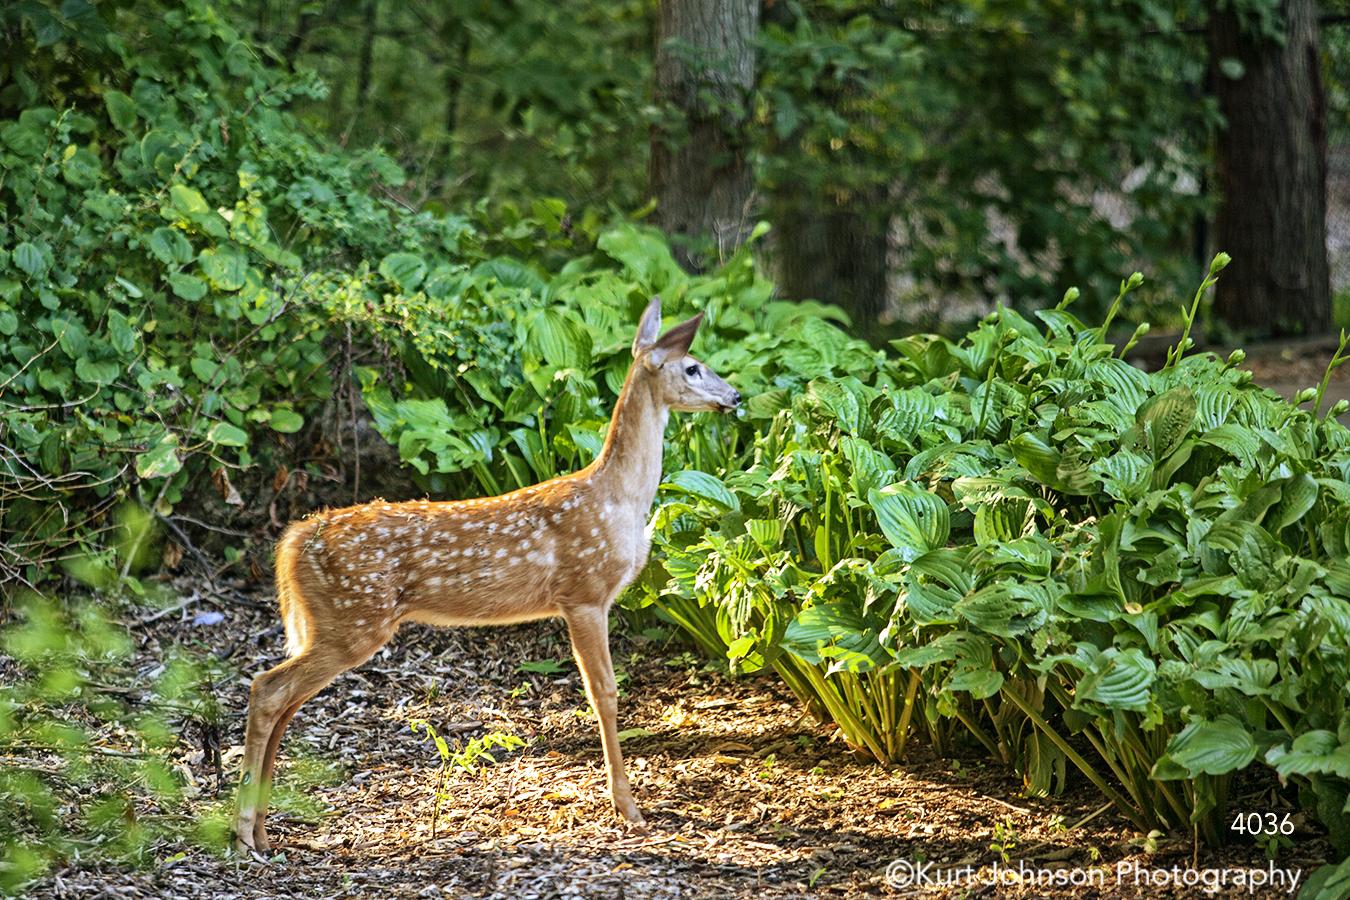 wildlife deer green grass animal